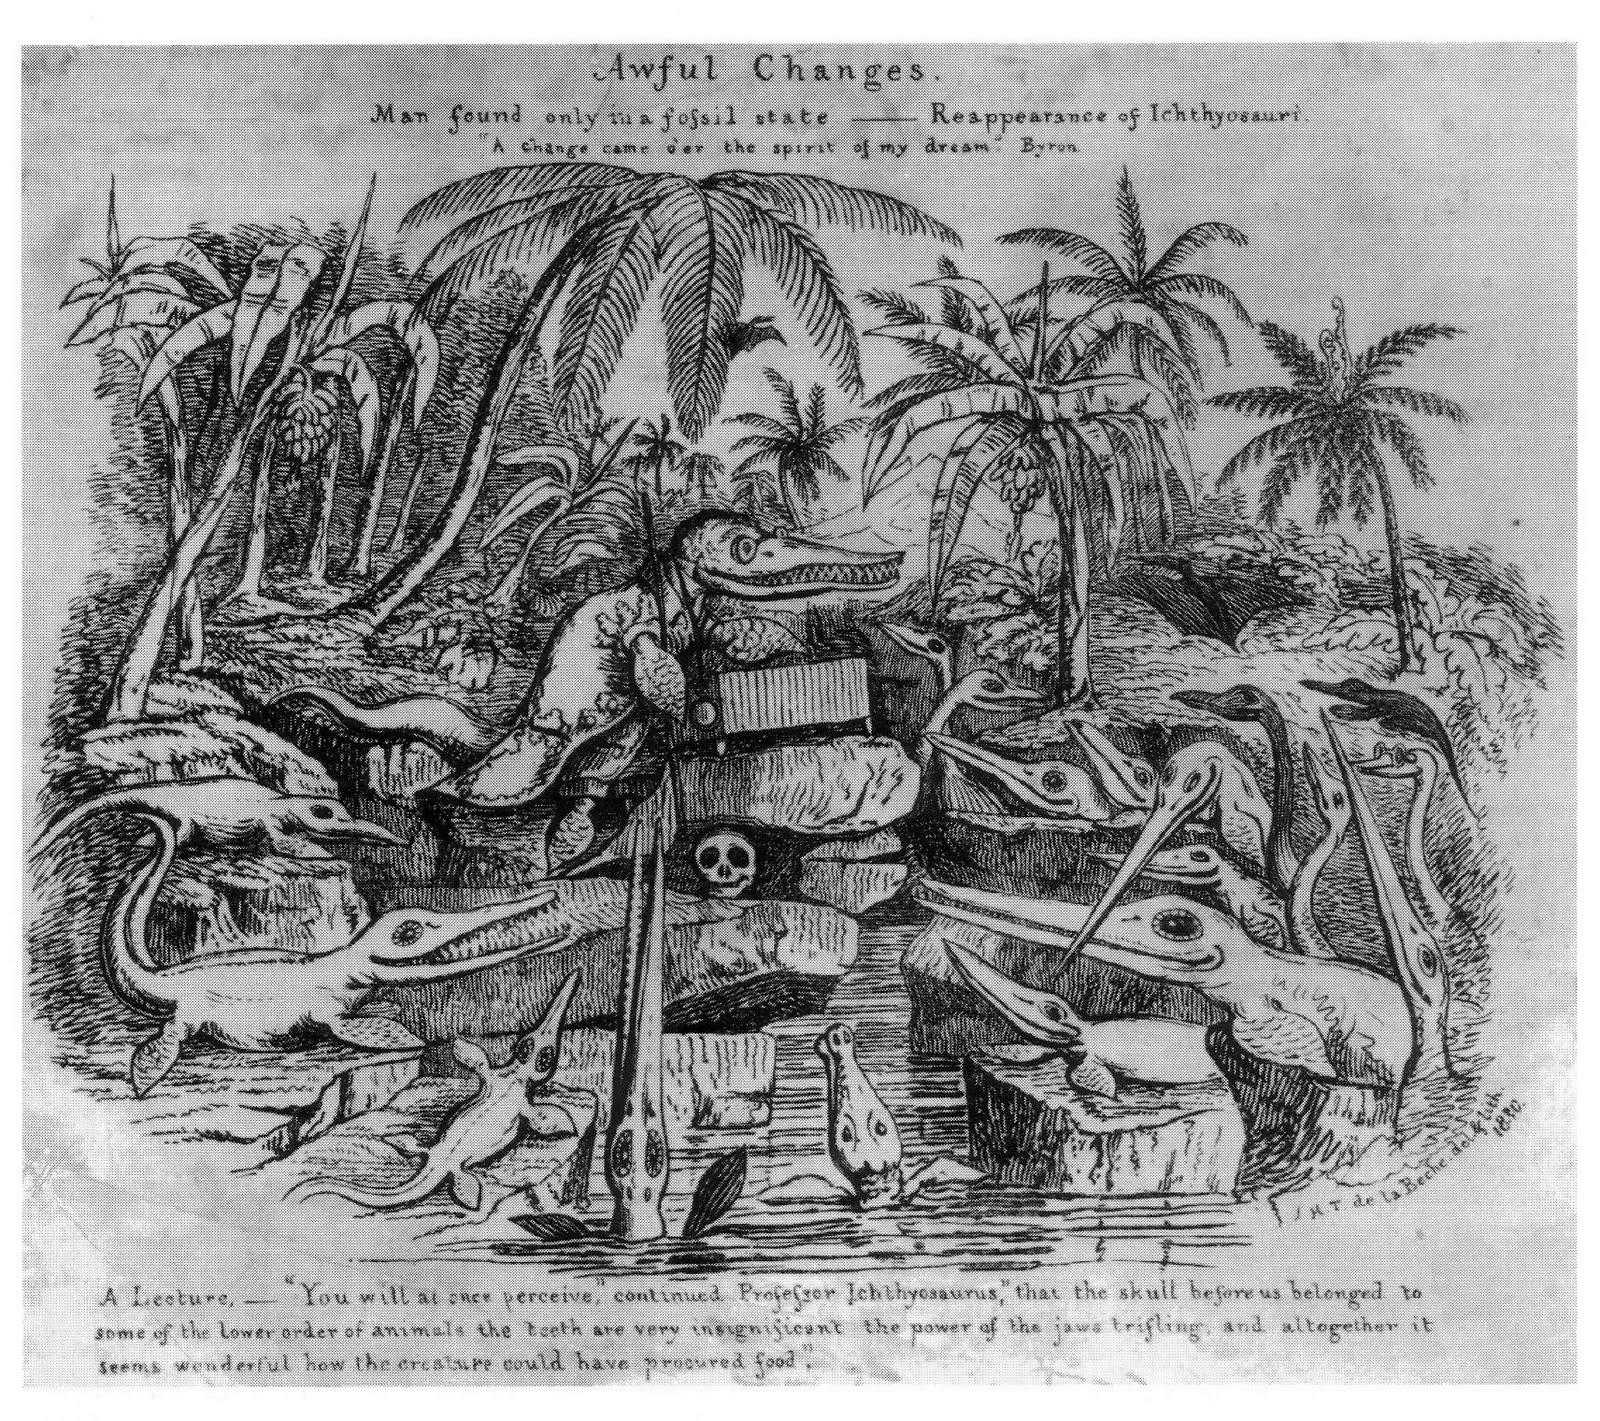 an essay on the fossil record benjamindbrooks blog